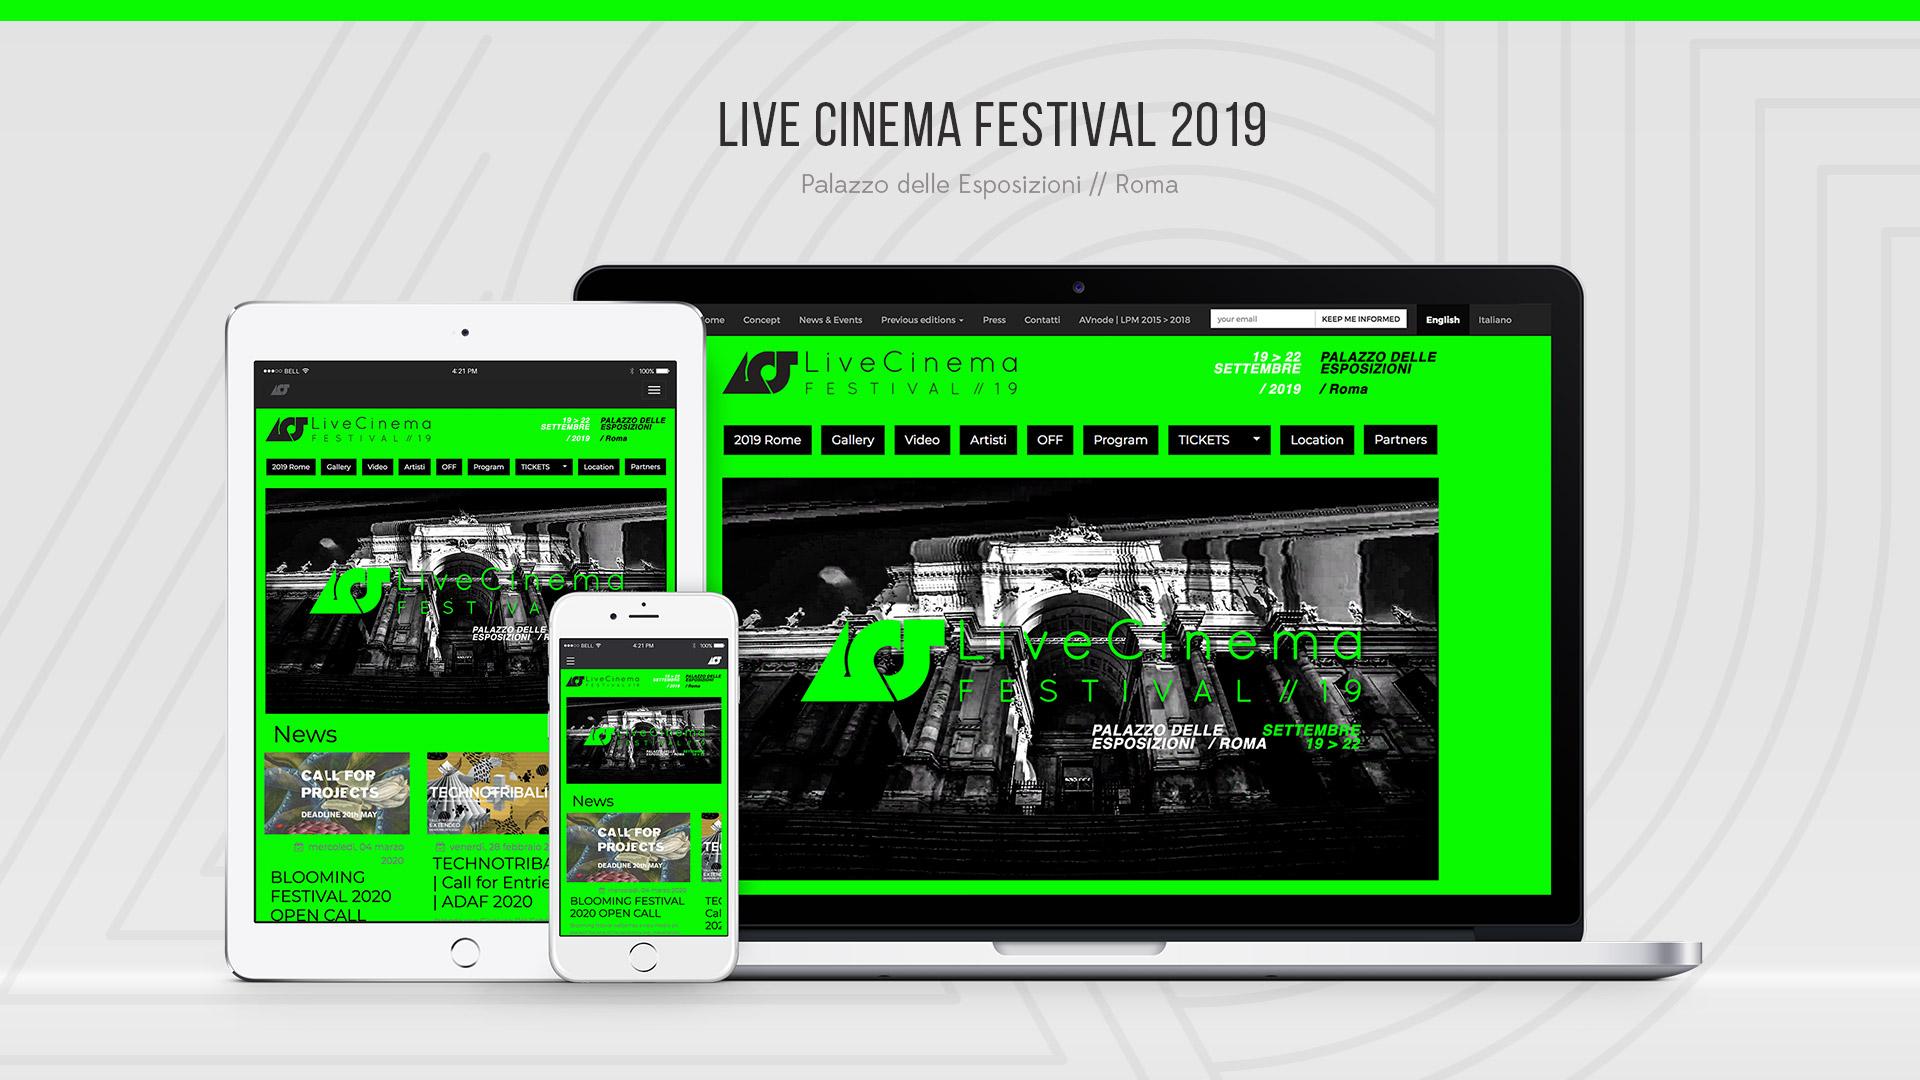 Live Cinema Festival 2019 – Web Site